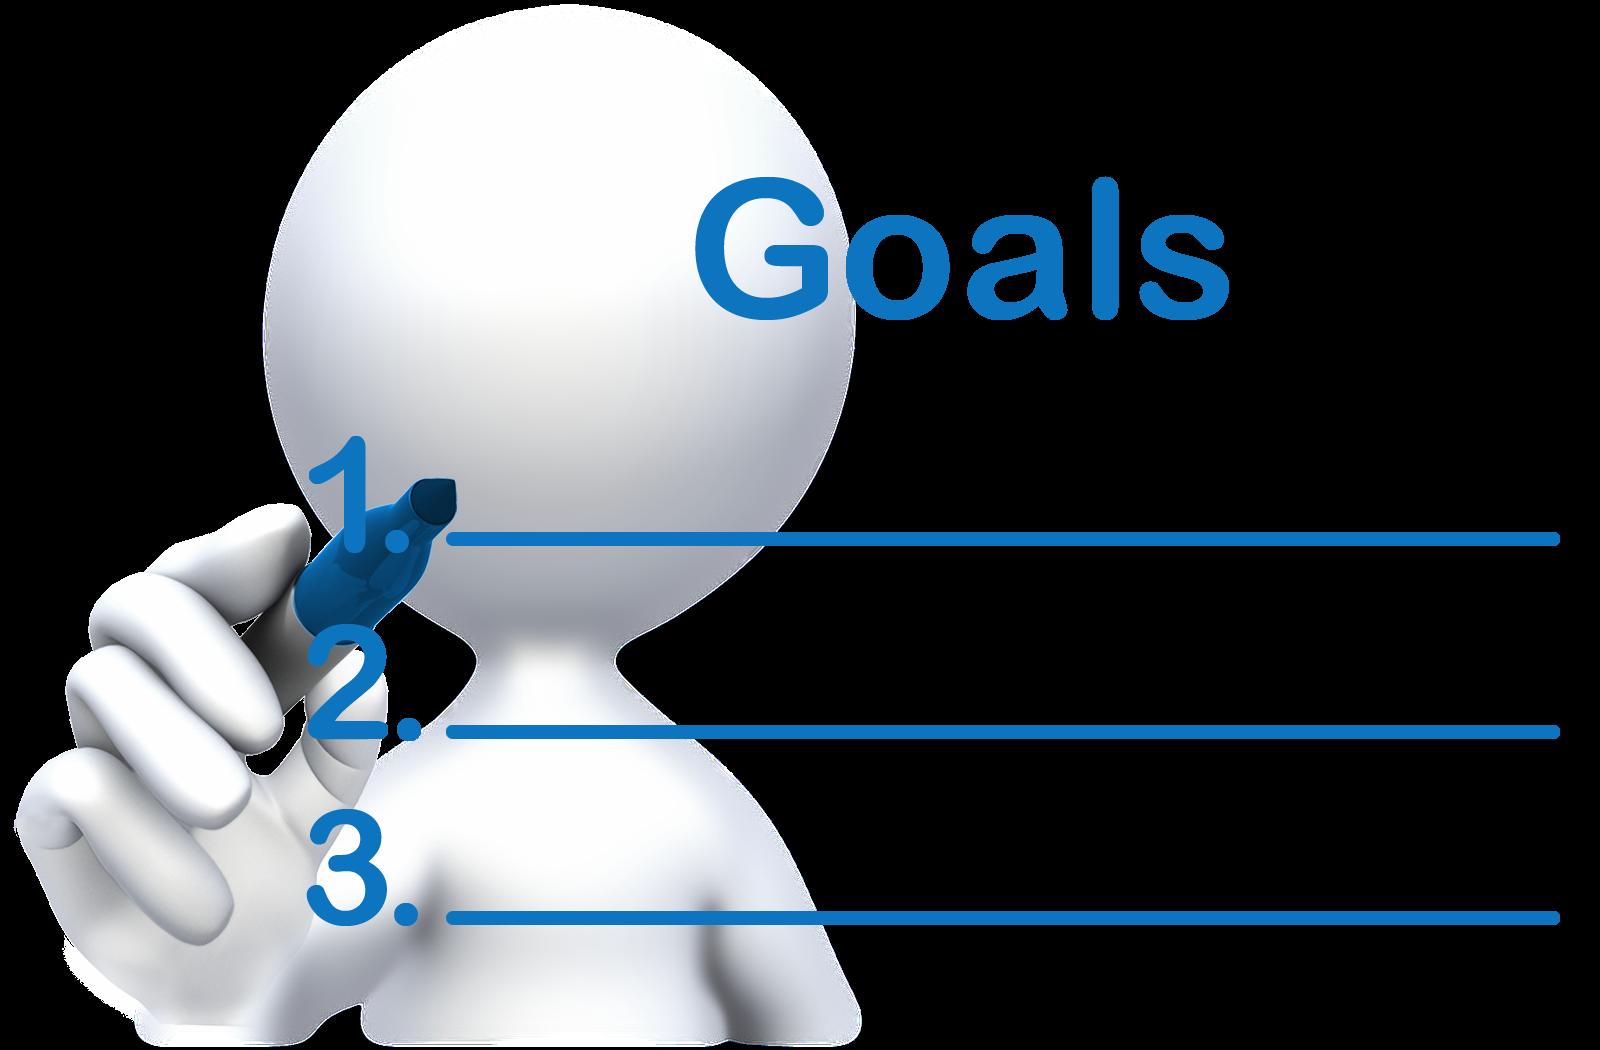 Statistics clipart leader. Focalpoint goals that are